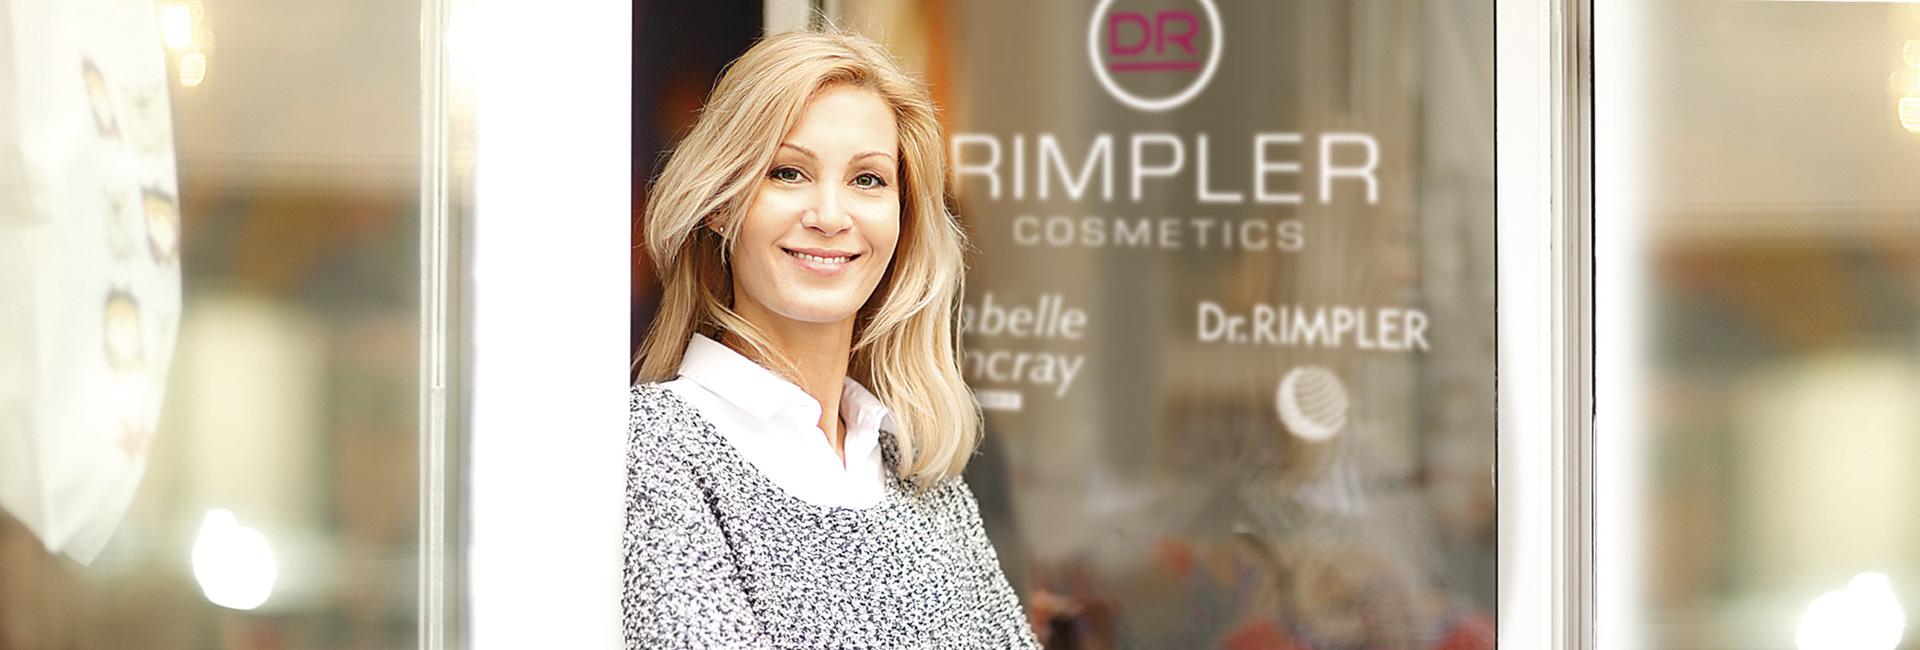 Fachhandel Kosmetik